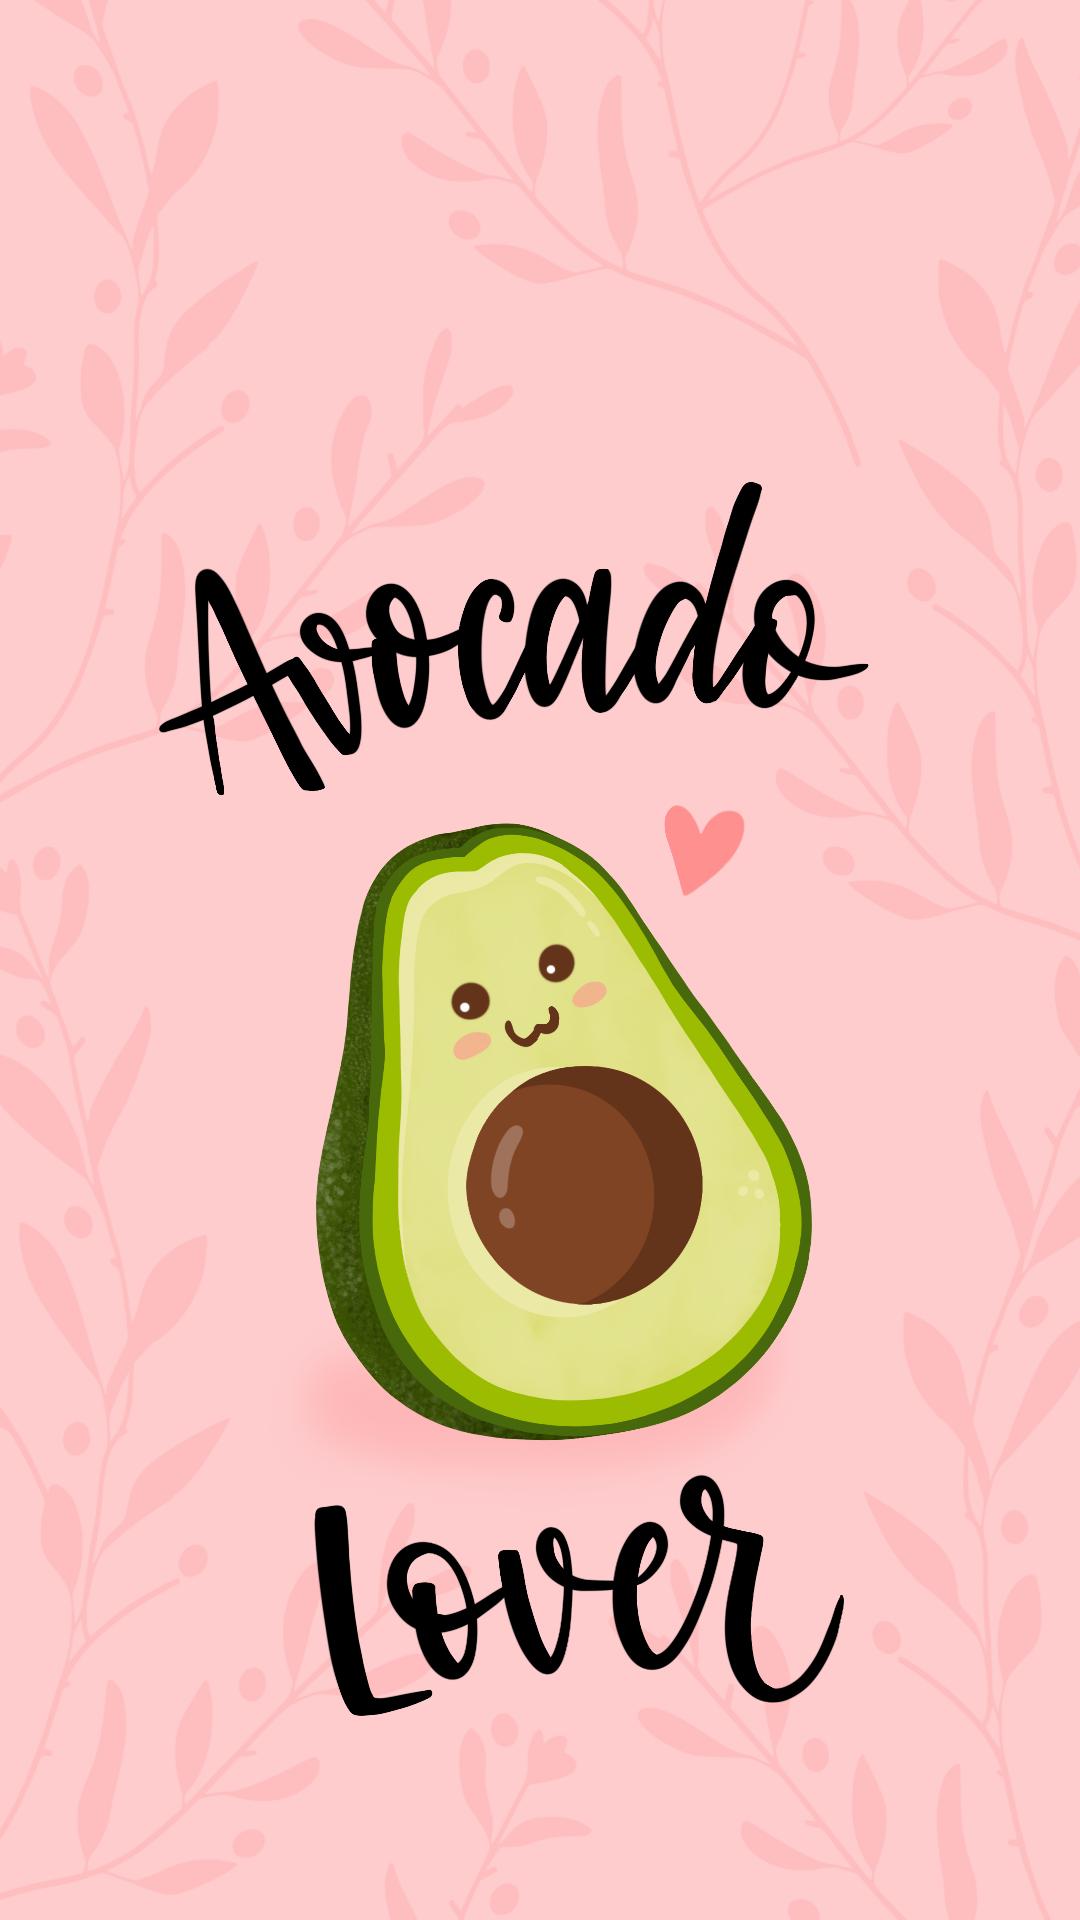 Avocado Avocado Lovers Food Food Lovers Pastel Colors Wallpaper Screensaver Iphone Wallpaper Wallpaper Iphone Cute Pink Wallpaper Iphone Ipod Wallpaper